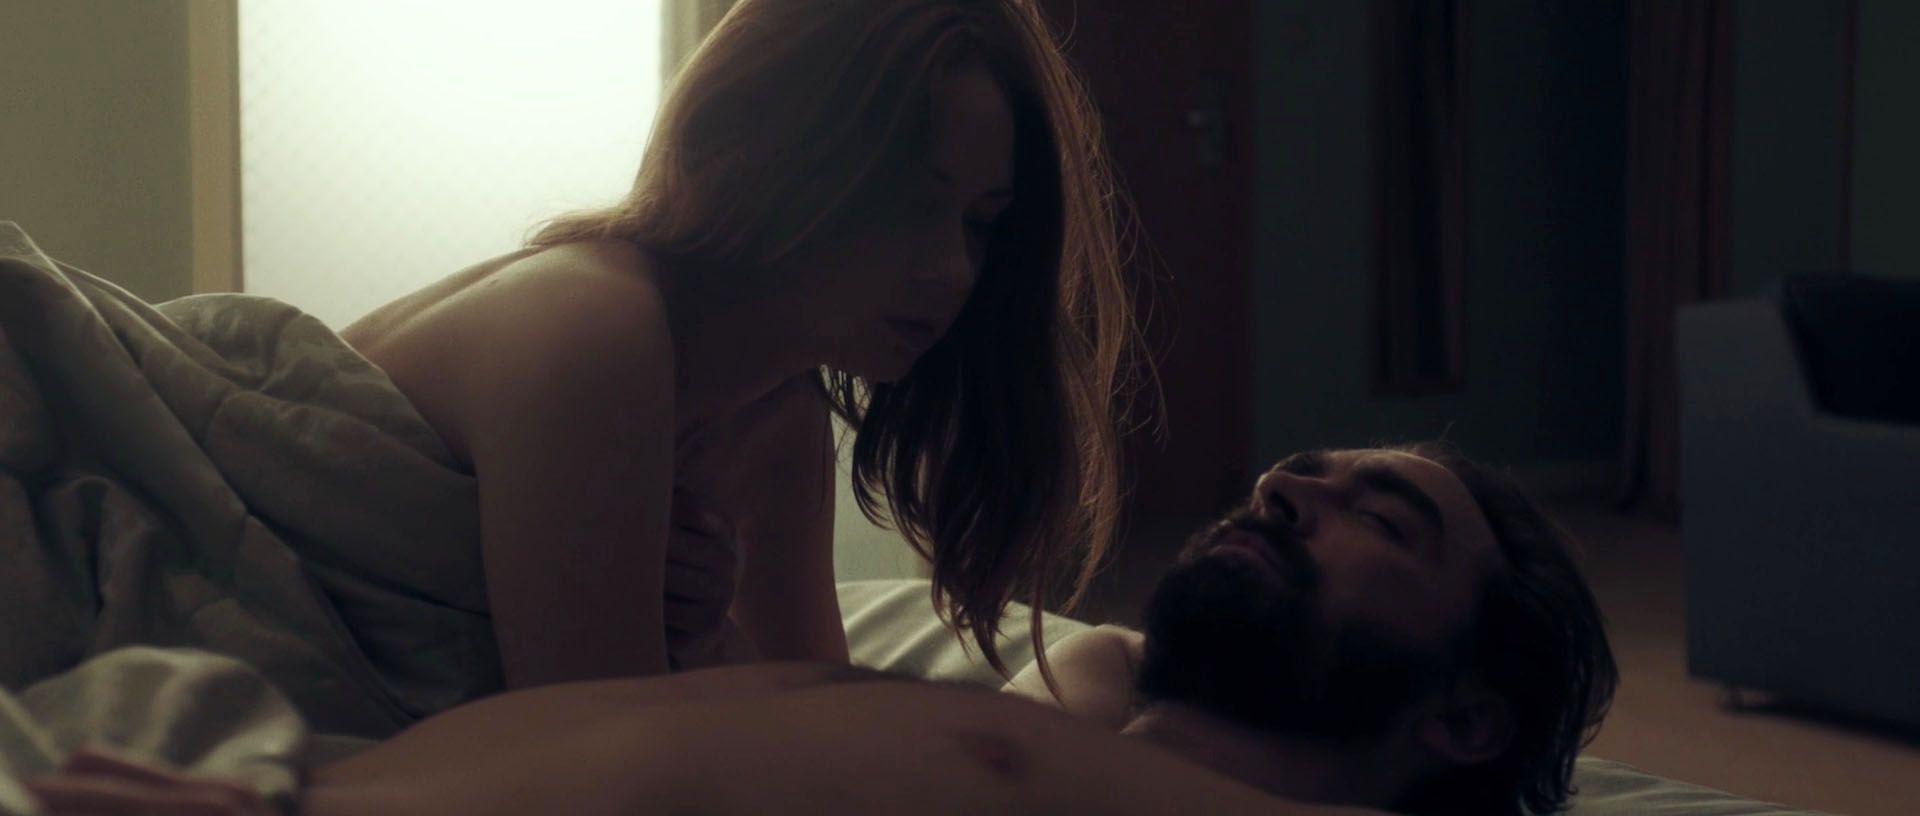 Karen gillan sex